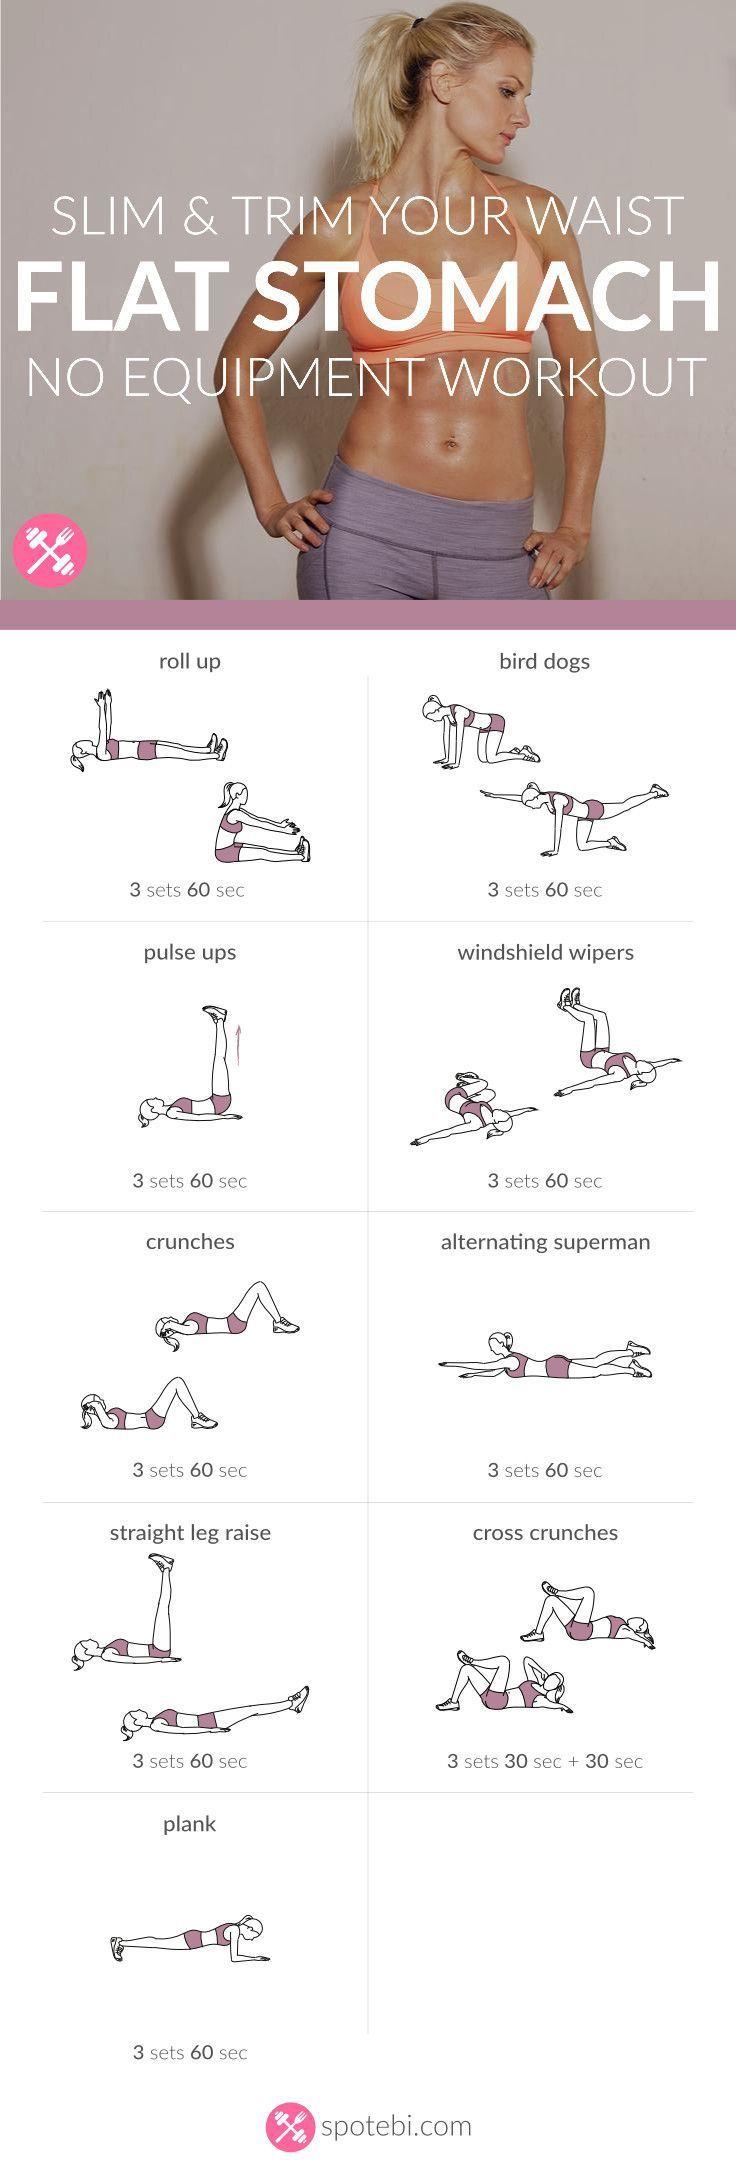 flat stomach workout fitness pinterest flat stomach workouts